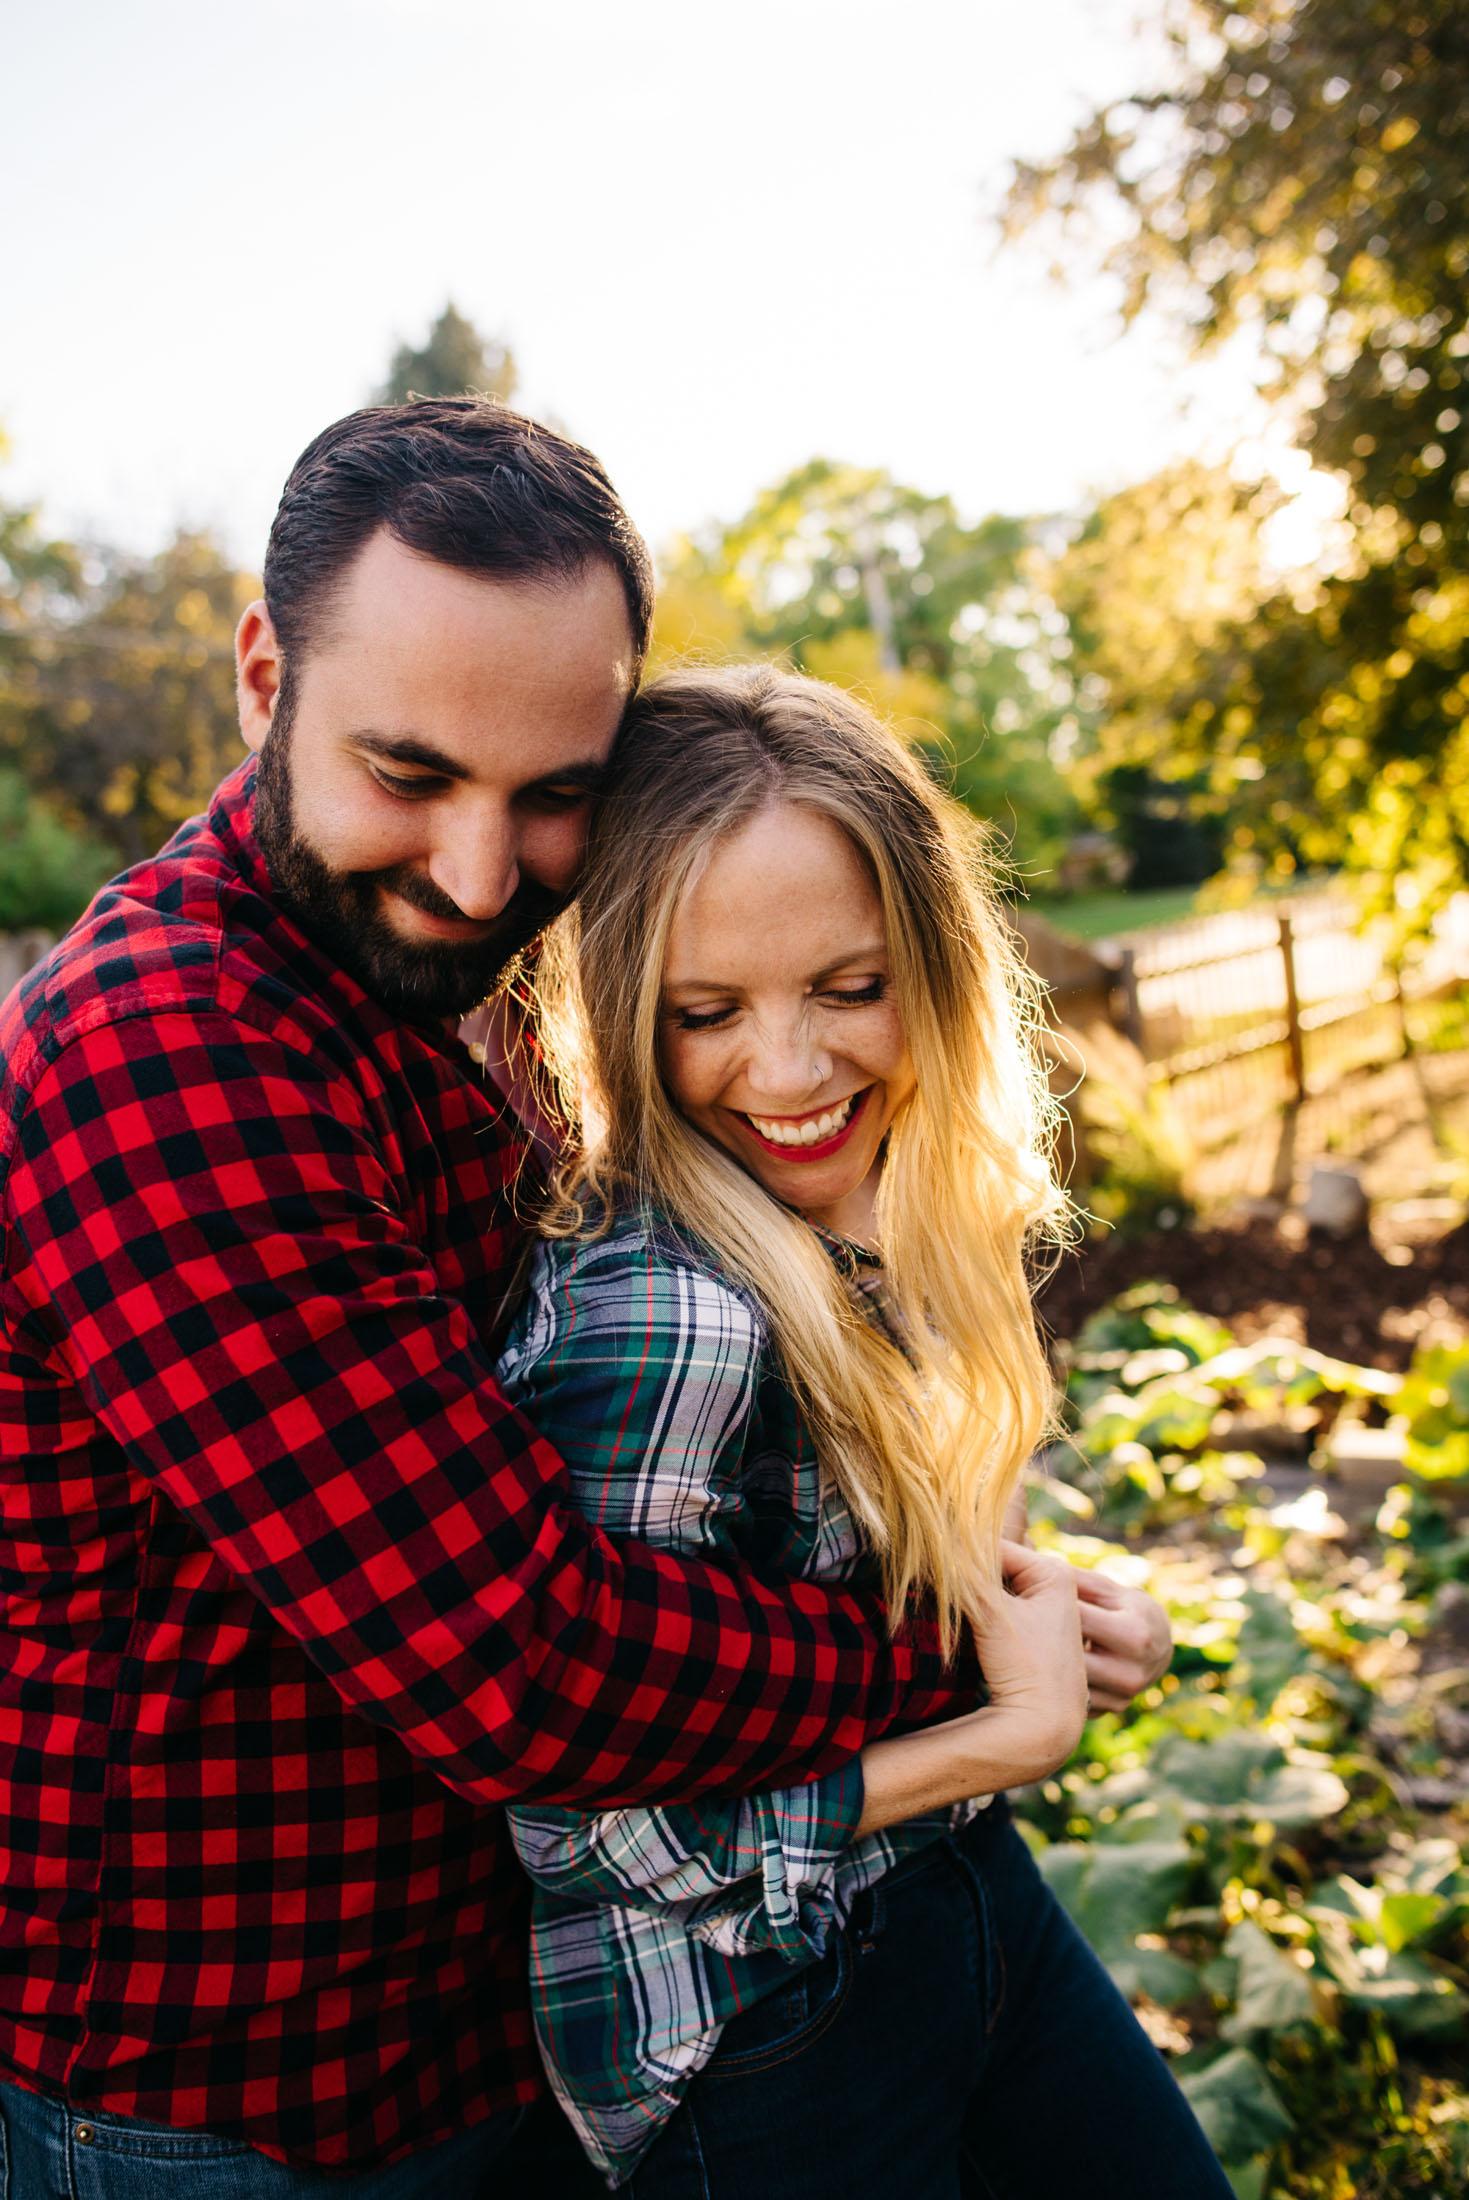 86-127couple-anniversary-engagement-photographer-colorado-denver_wedding_photographer_photo_At-Home-Session-Colorado-photographer-Brian&Kaite-Oct2017--573.jpg